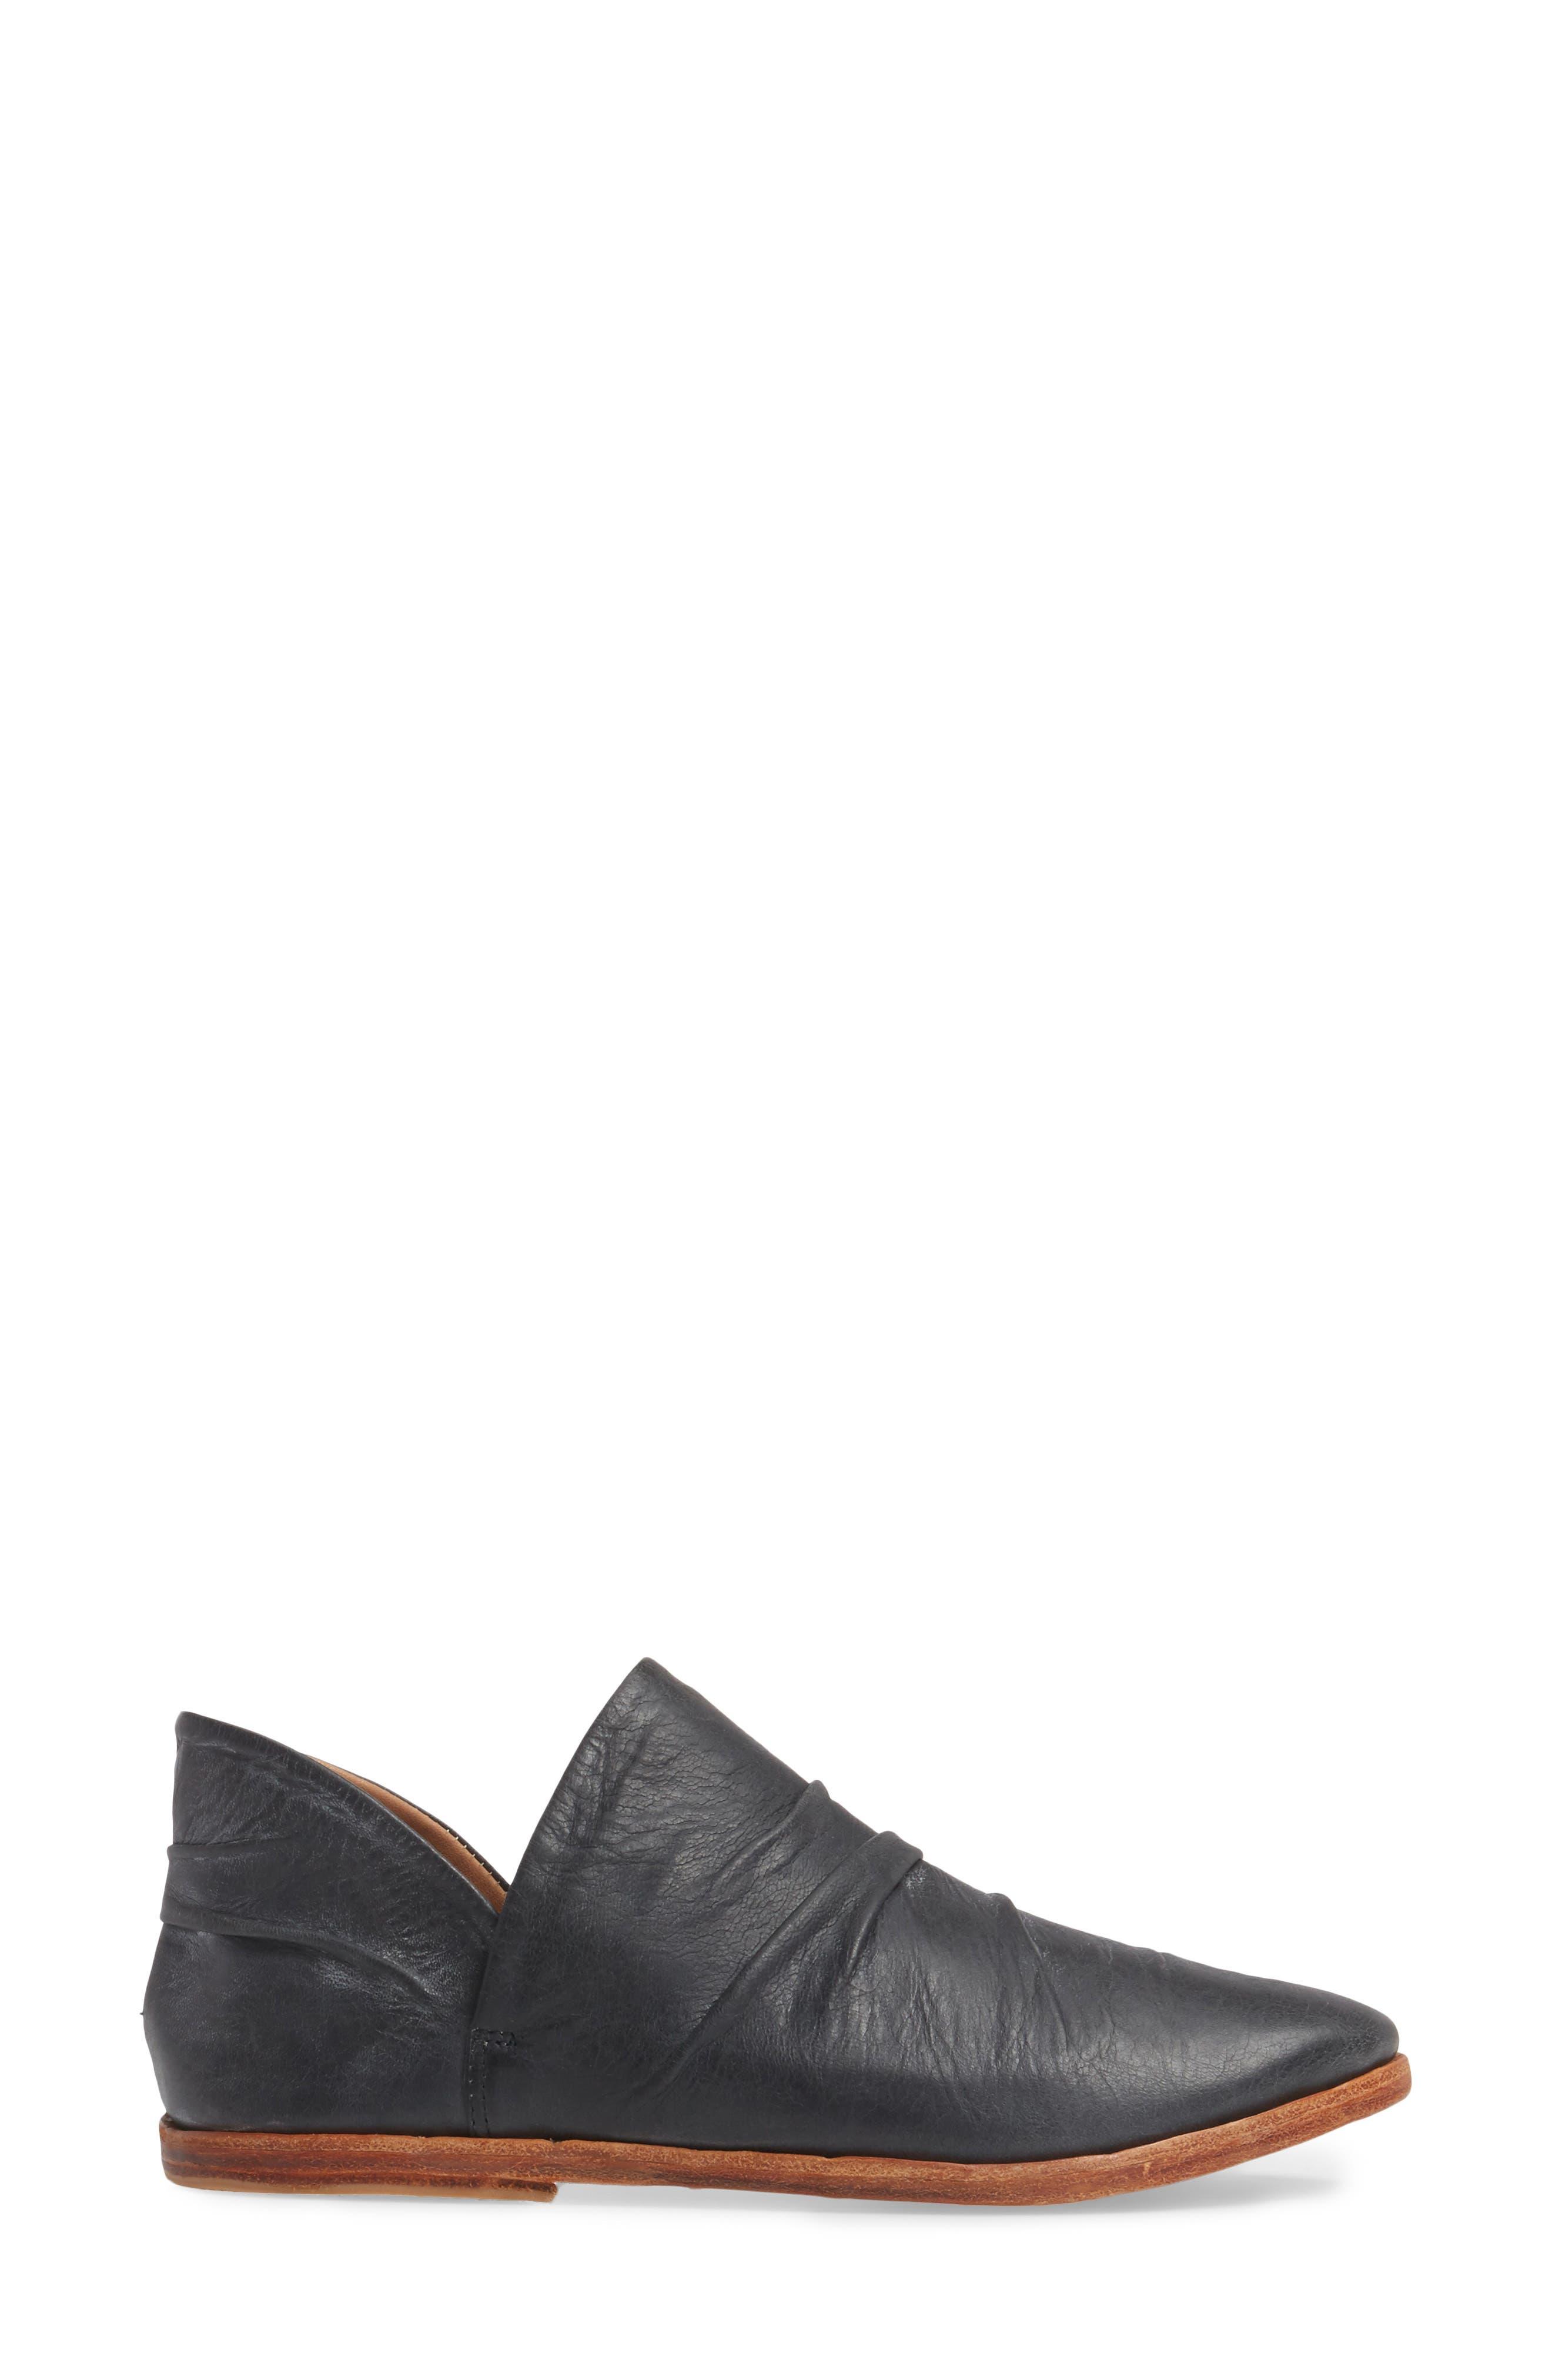 Puffin Loafer,                             Alternate thumbnail 3, color,                             Vintage Black